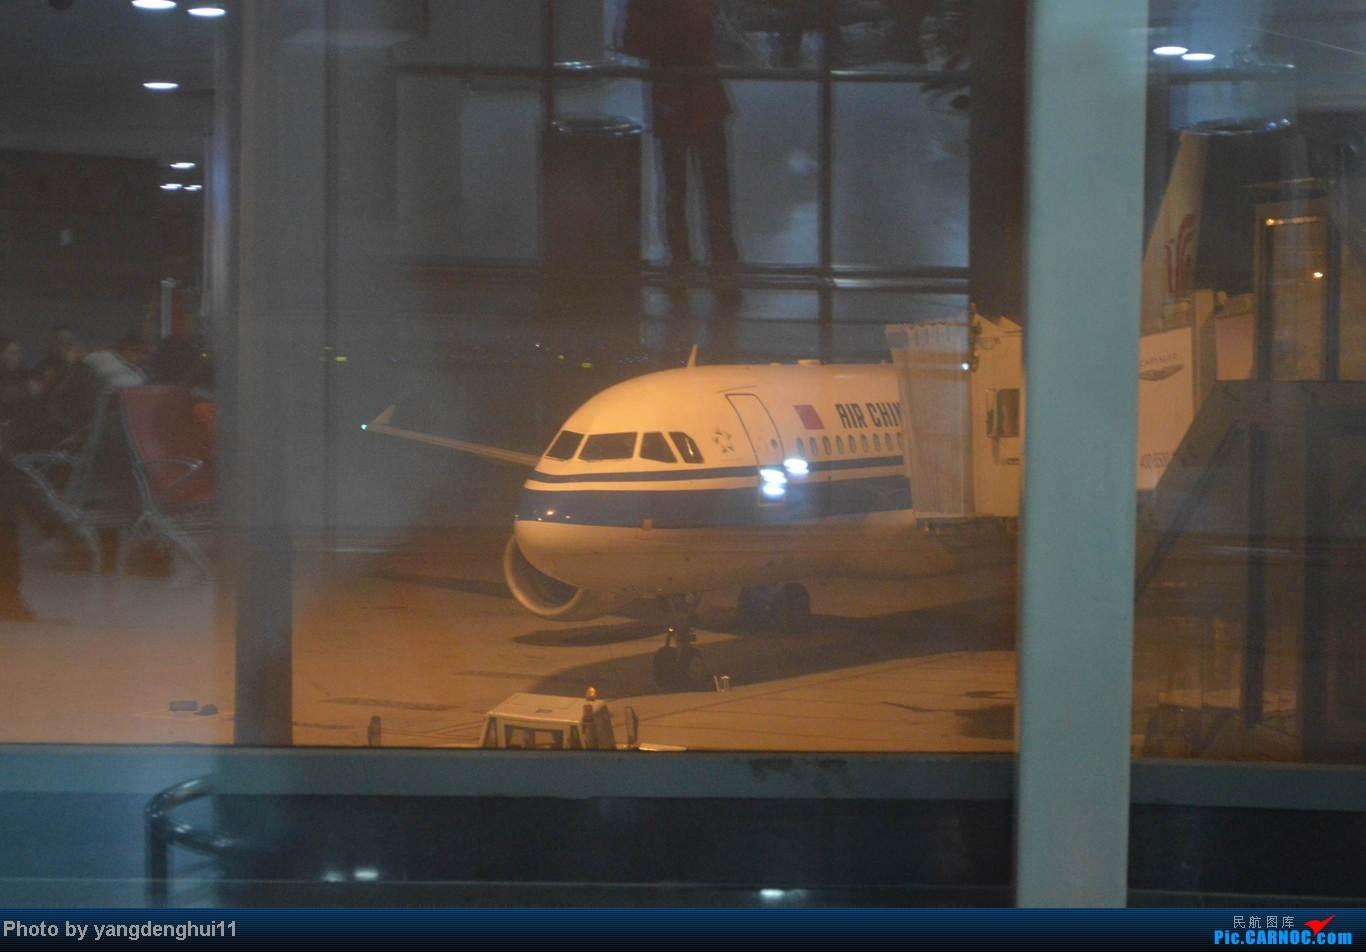 Re:[原创]春运帖 成都--上海虹桥--虹桥站--鳌江站 遇蓝凤凰,梦想之翼 AIRBUS A320